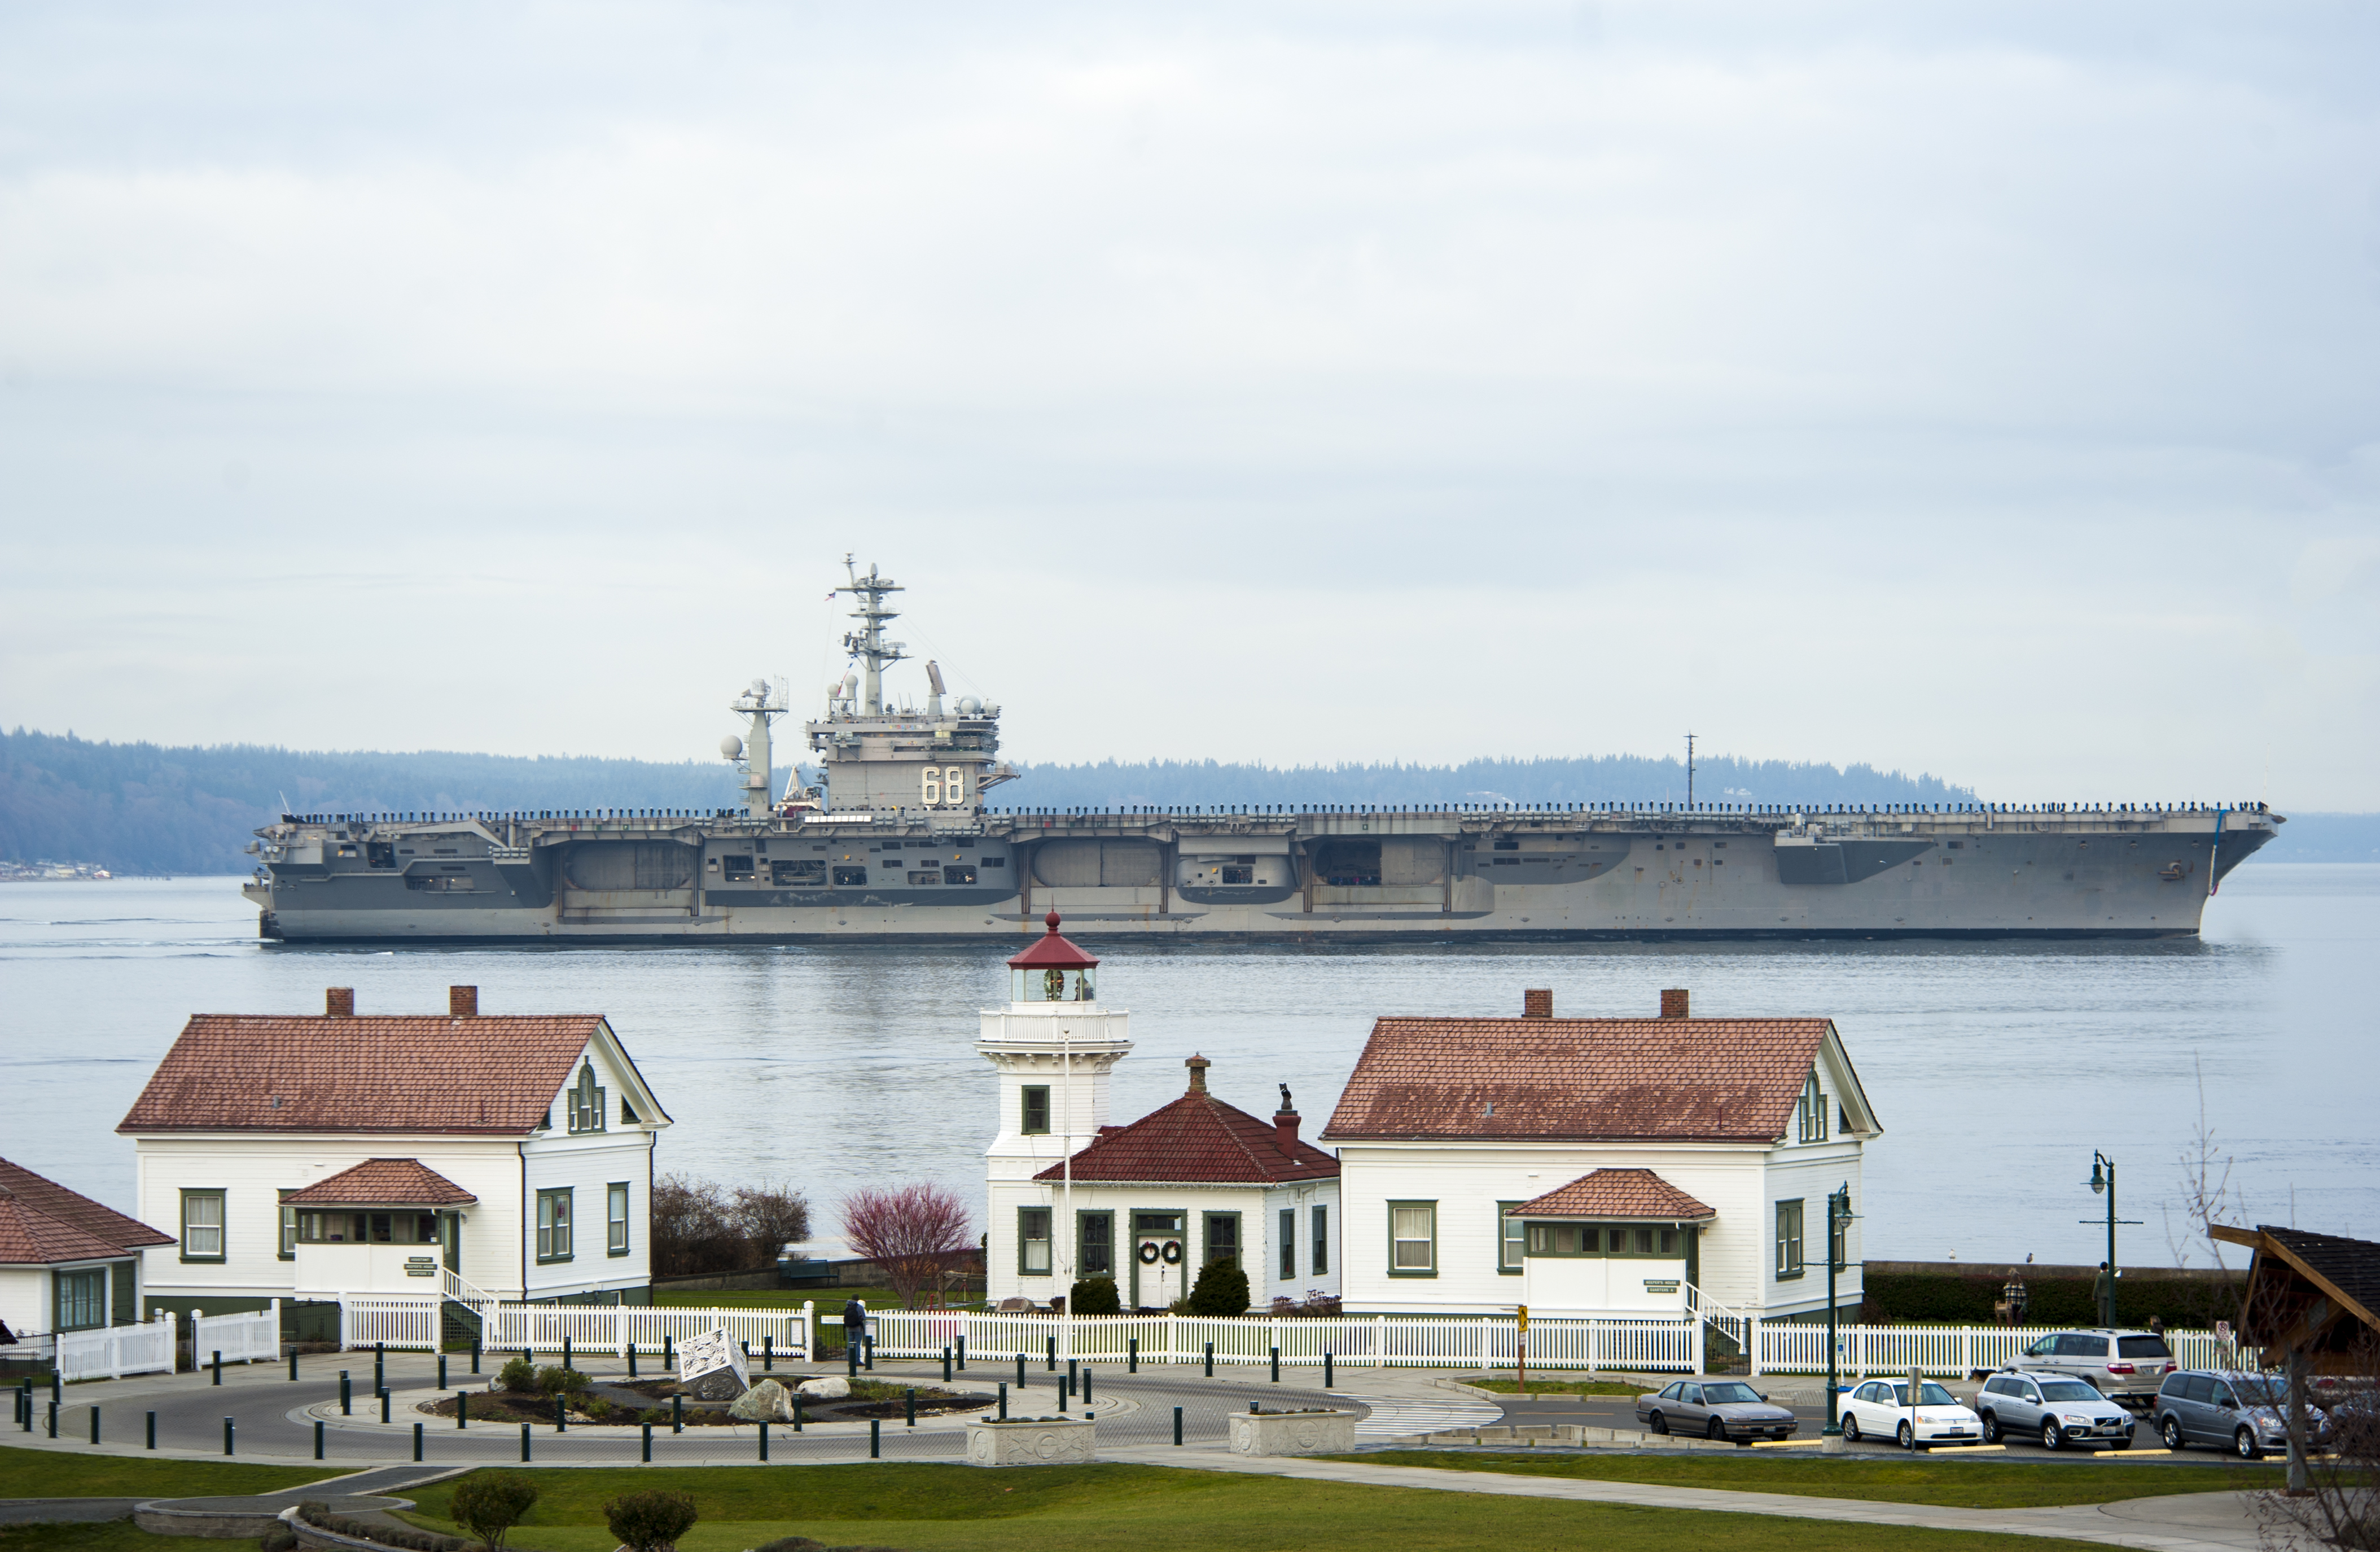 USS NIMITZ CVN-68 Einlaufen Everett am 16.12.2013 Bild: U.S. Navy